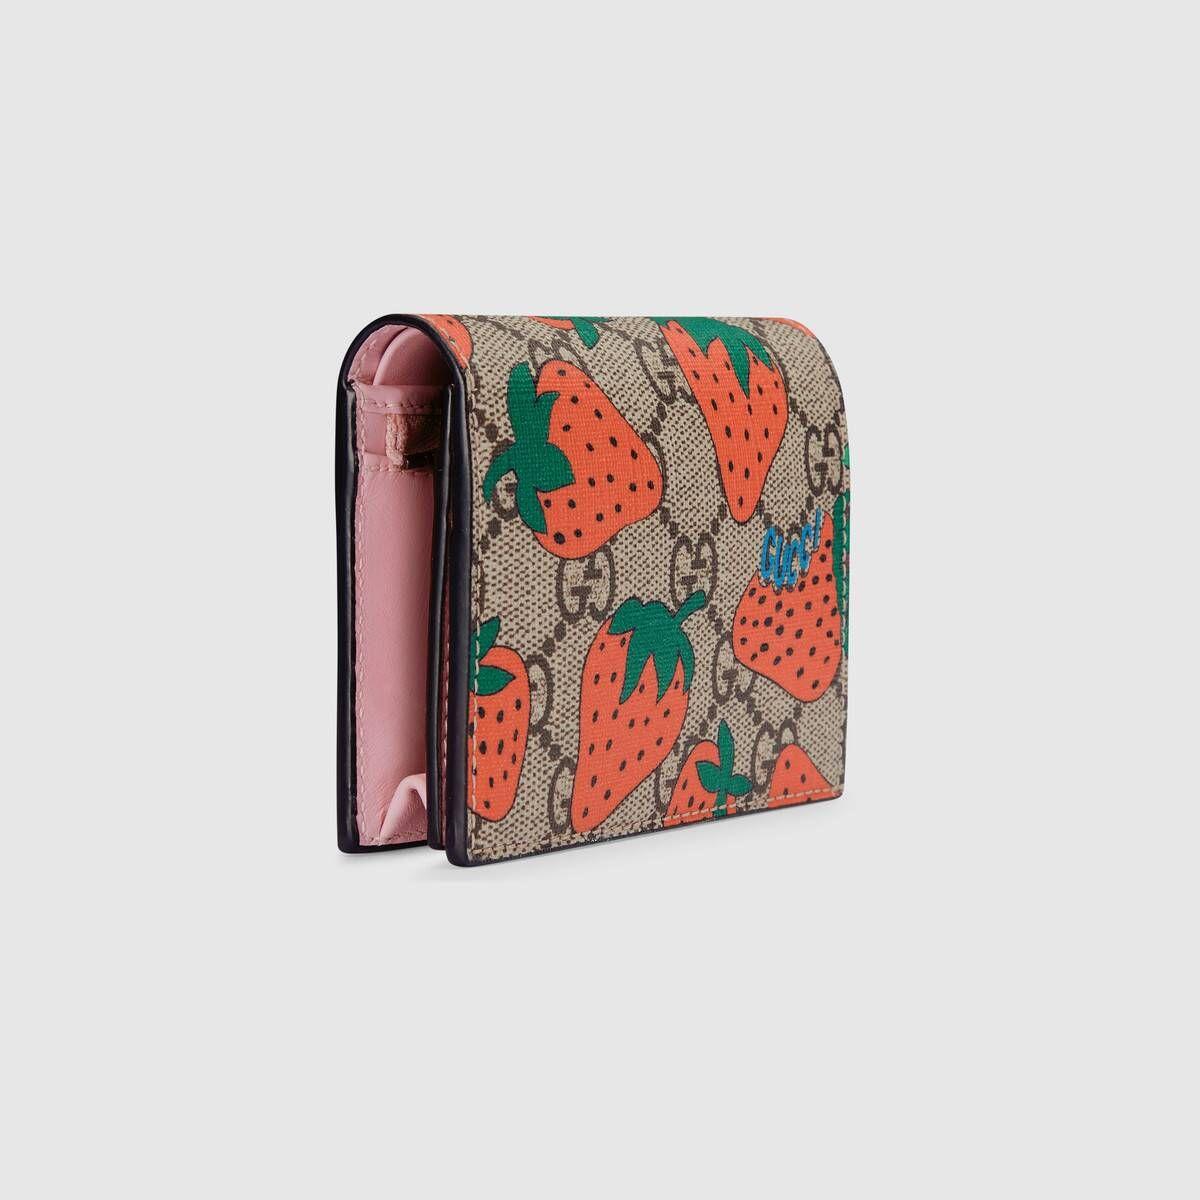 Gucci , GG Gucci Strawberry print card case wallet